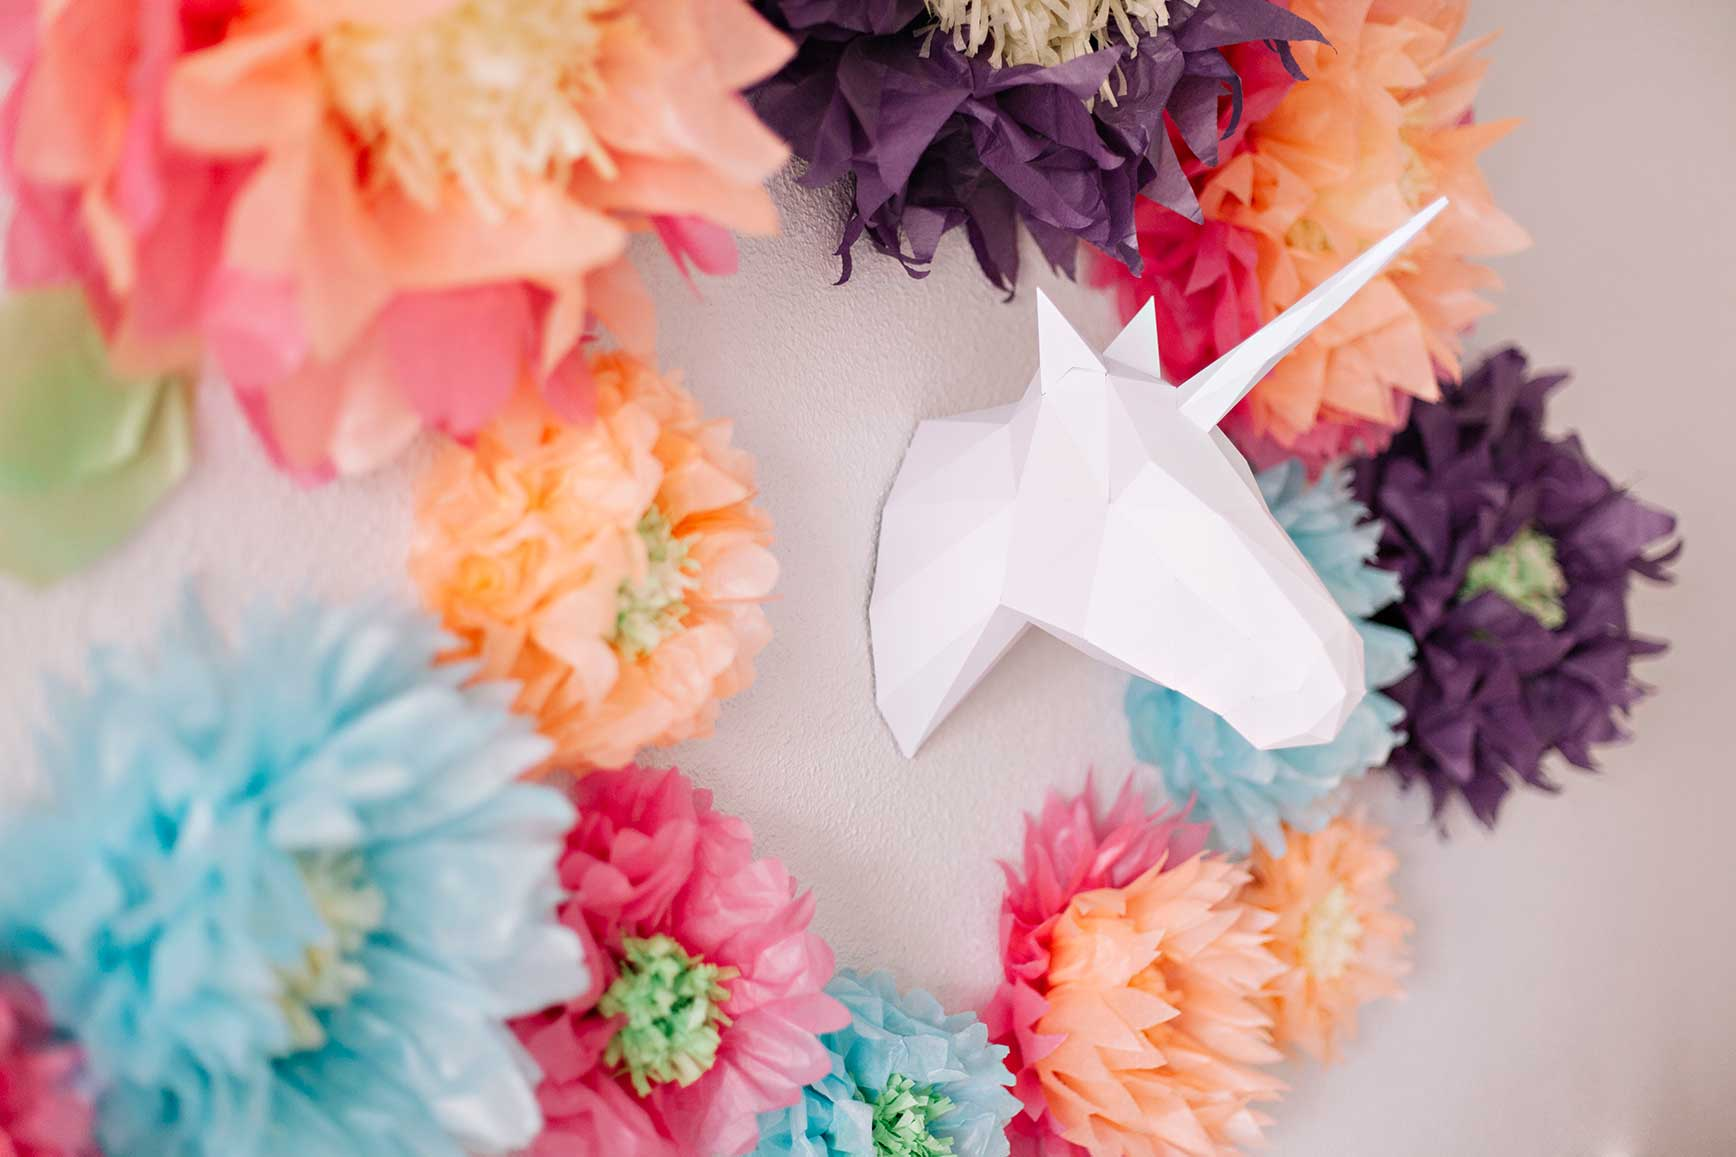 Fiesta de Unicornios - Unicorn Birthday Party 4